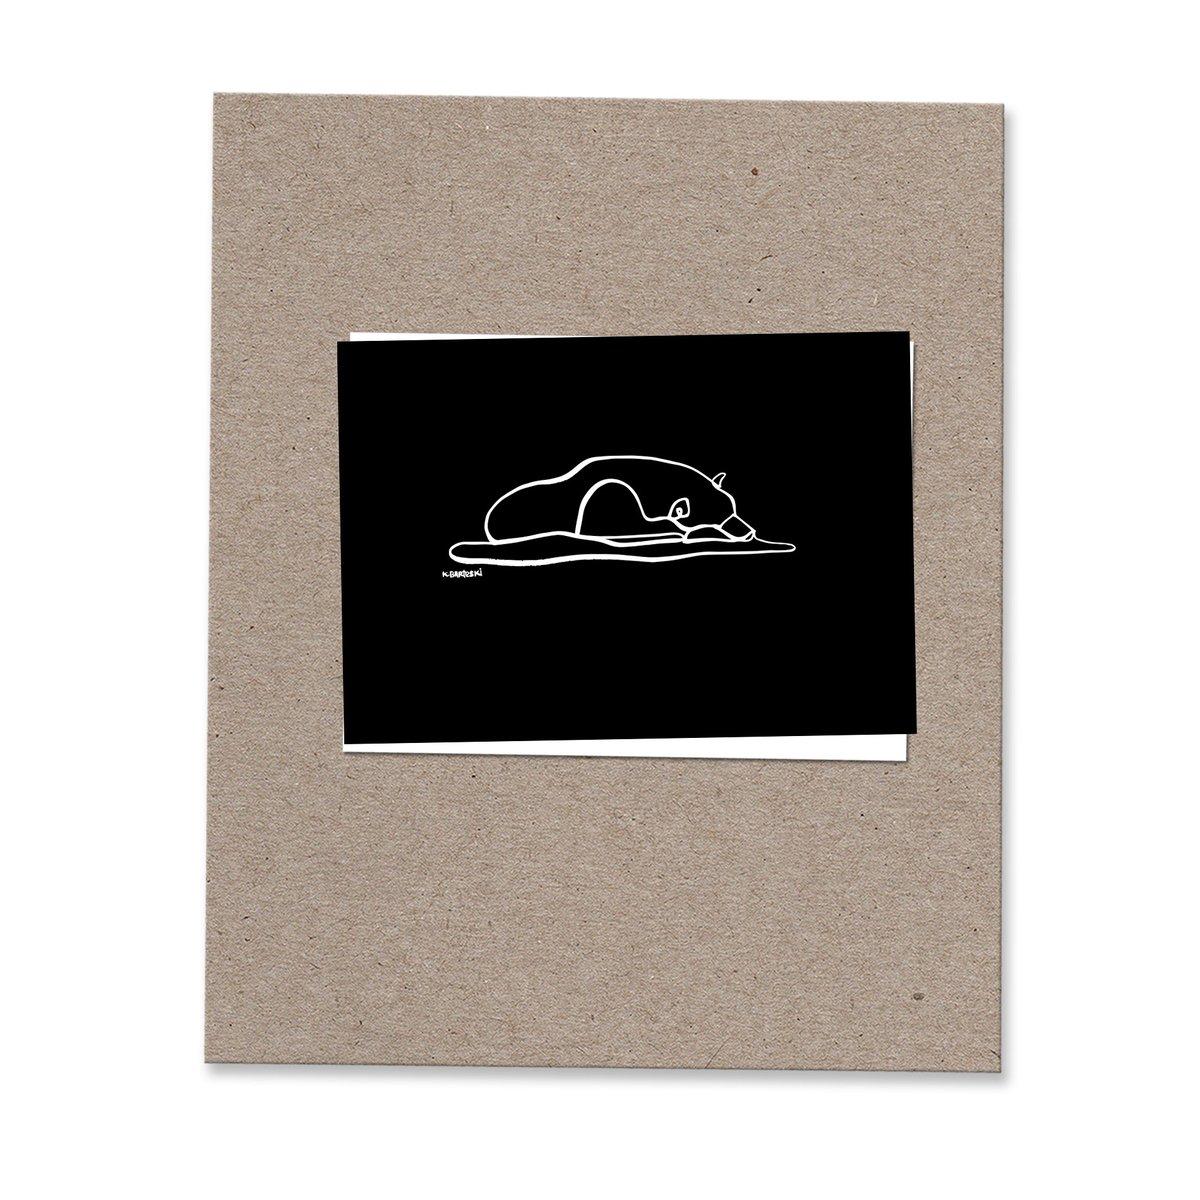 Image of SLEEPING BEAR mini print